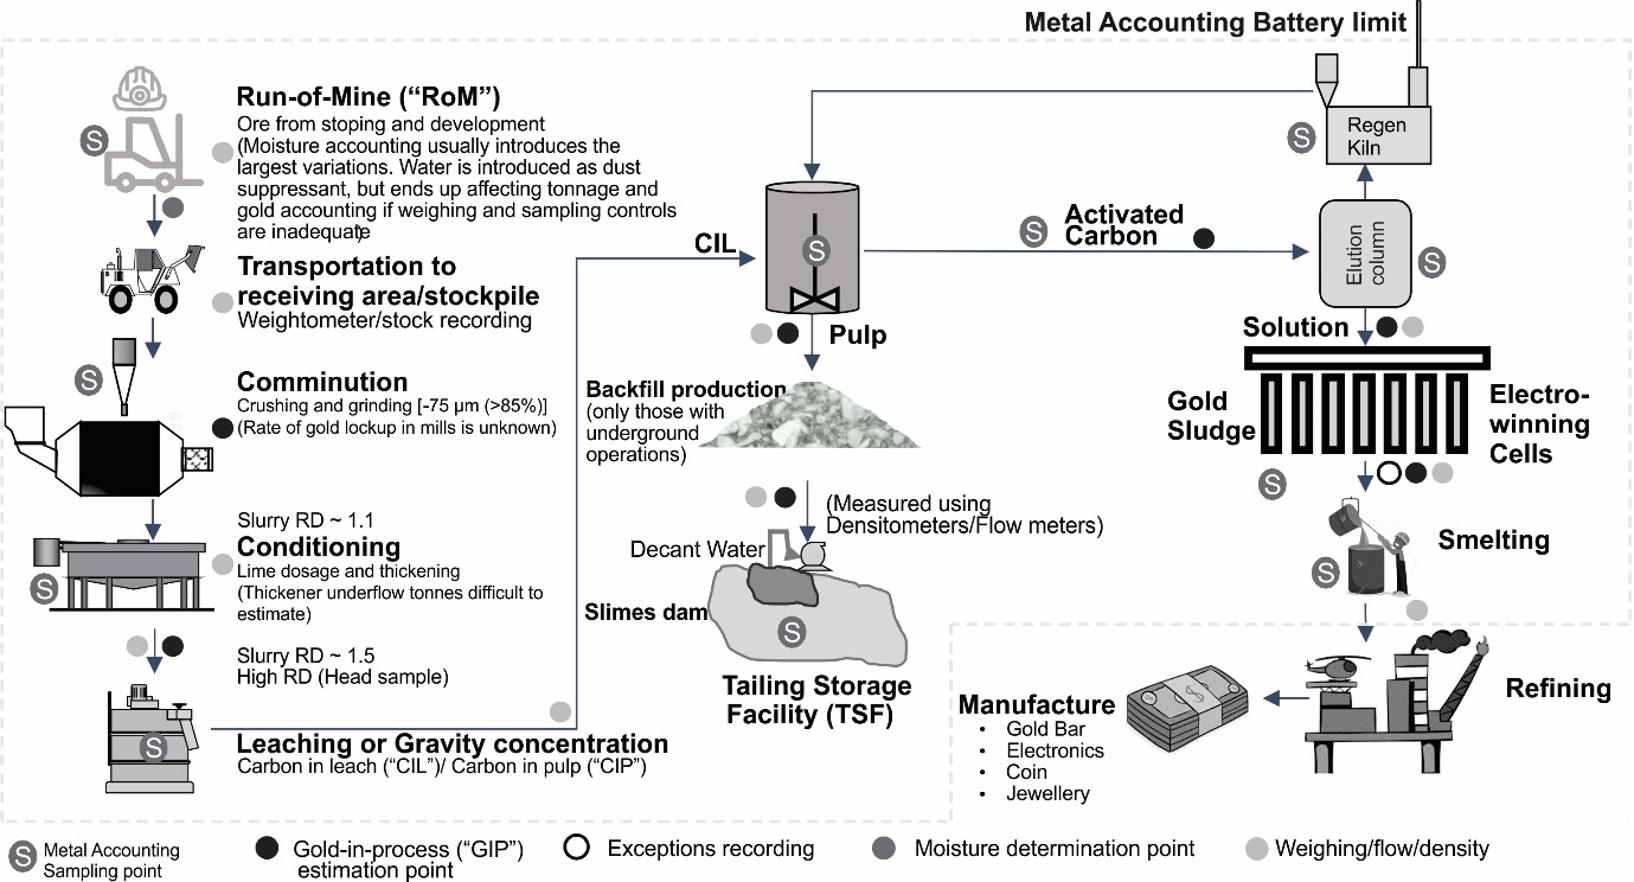 Metal Accounting